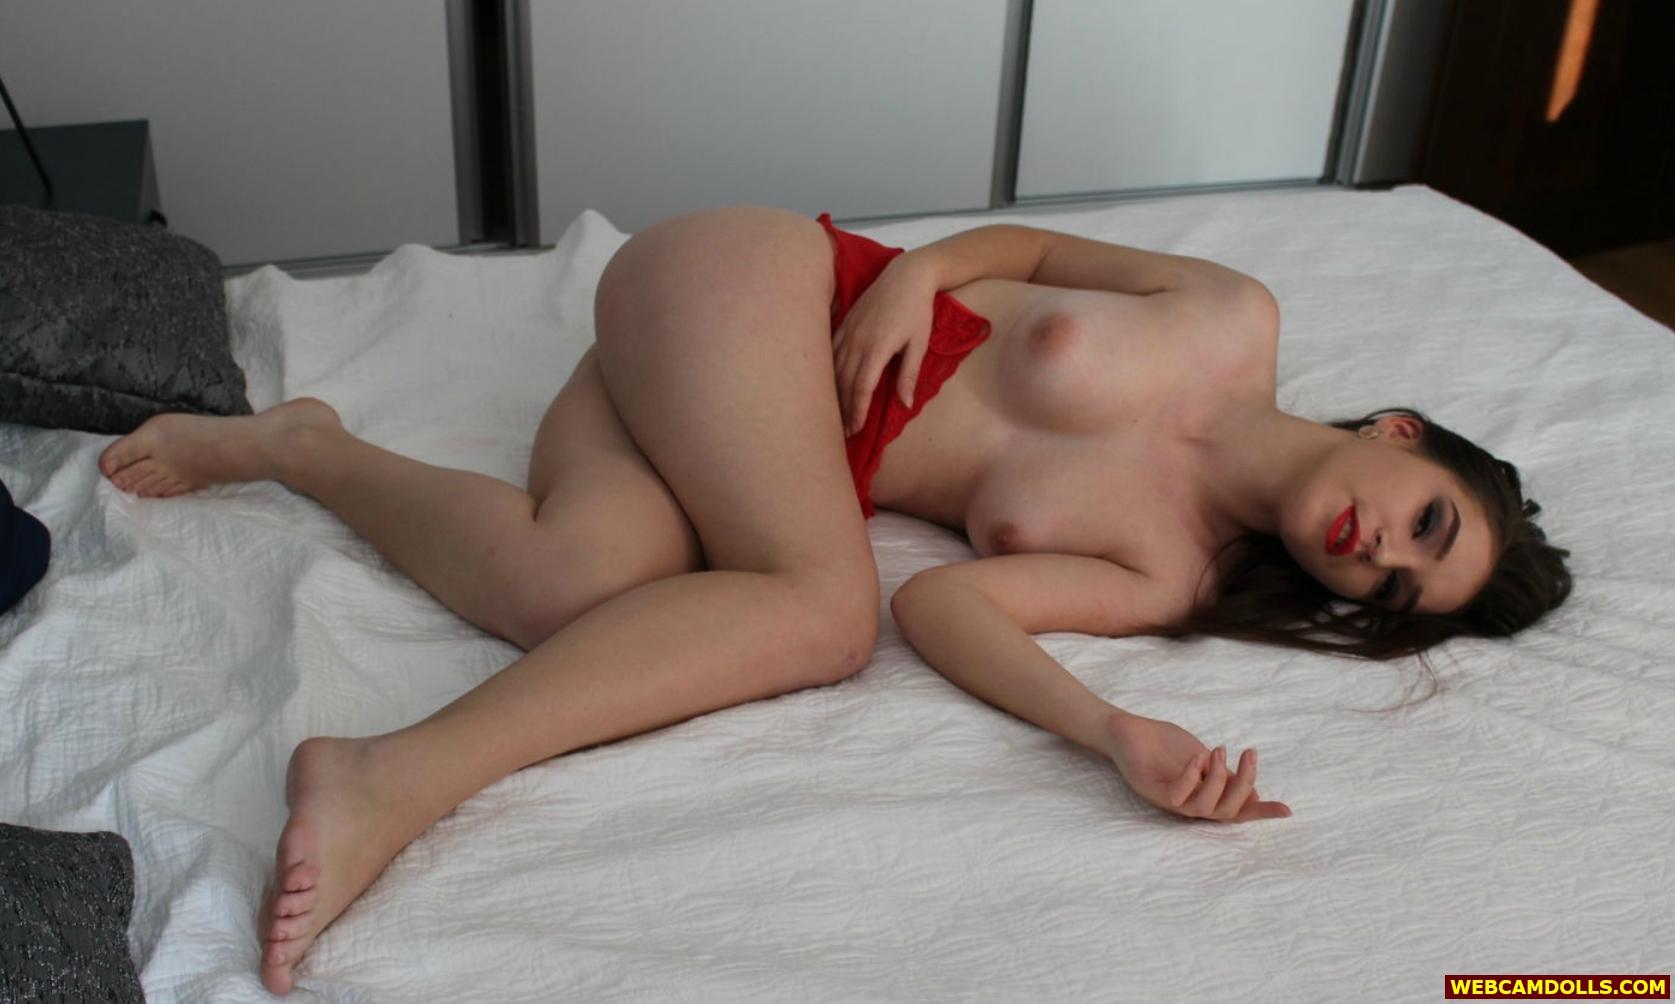 Nude girl in bed bare feet, kjol sex scene